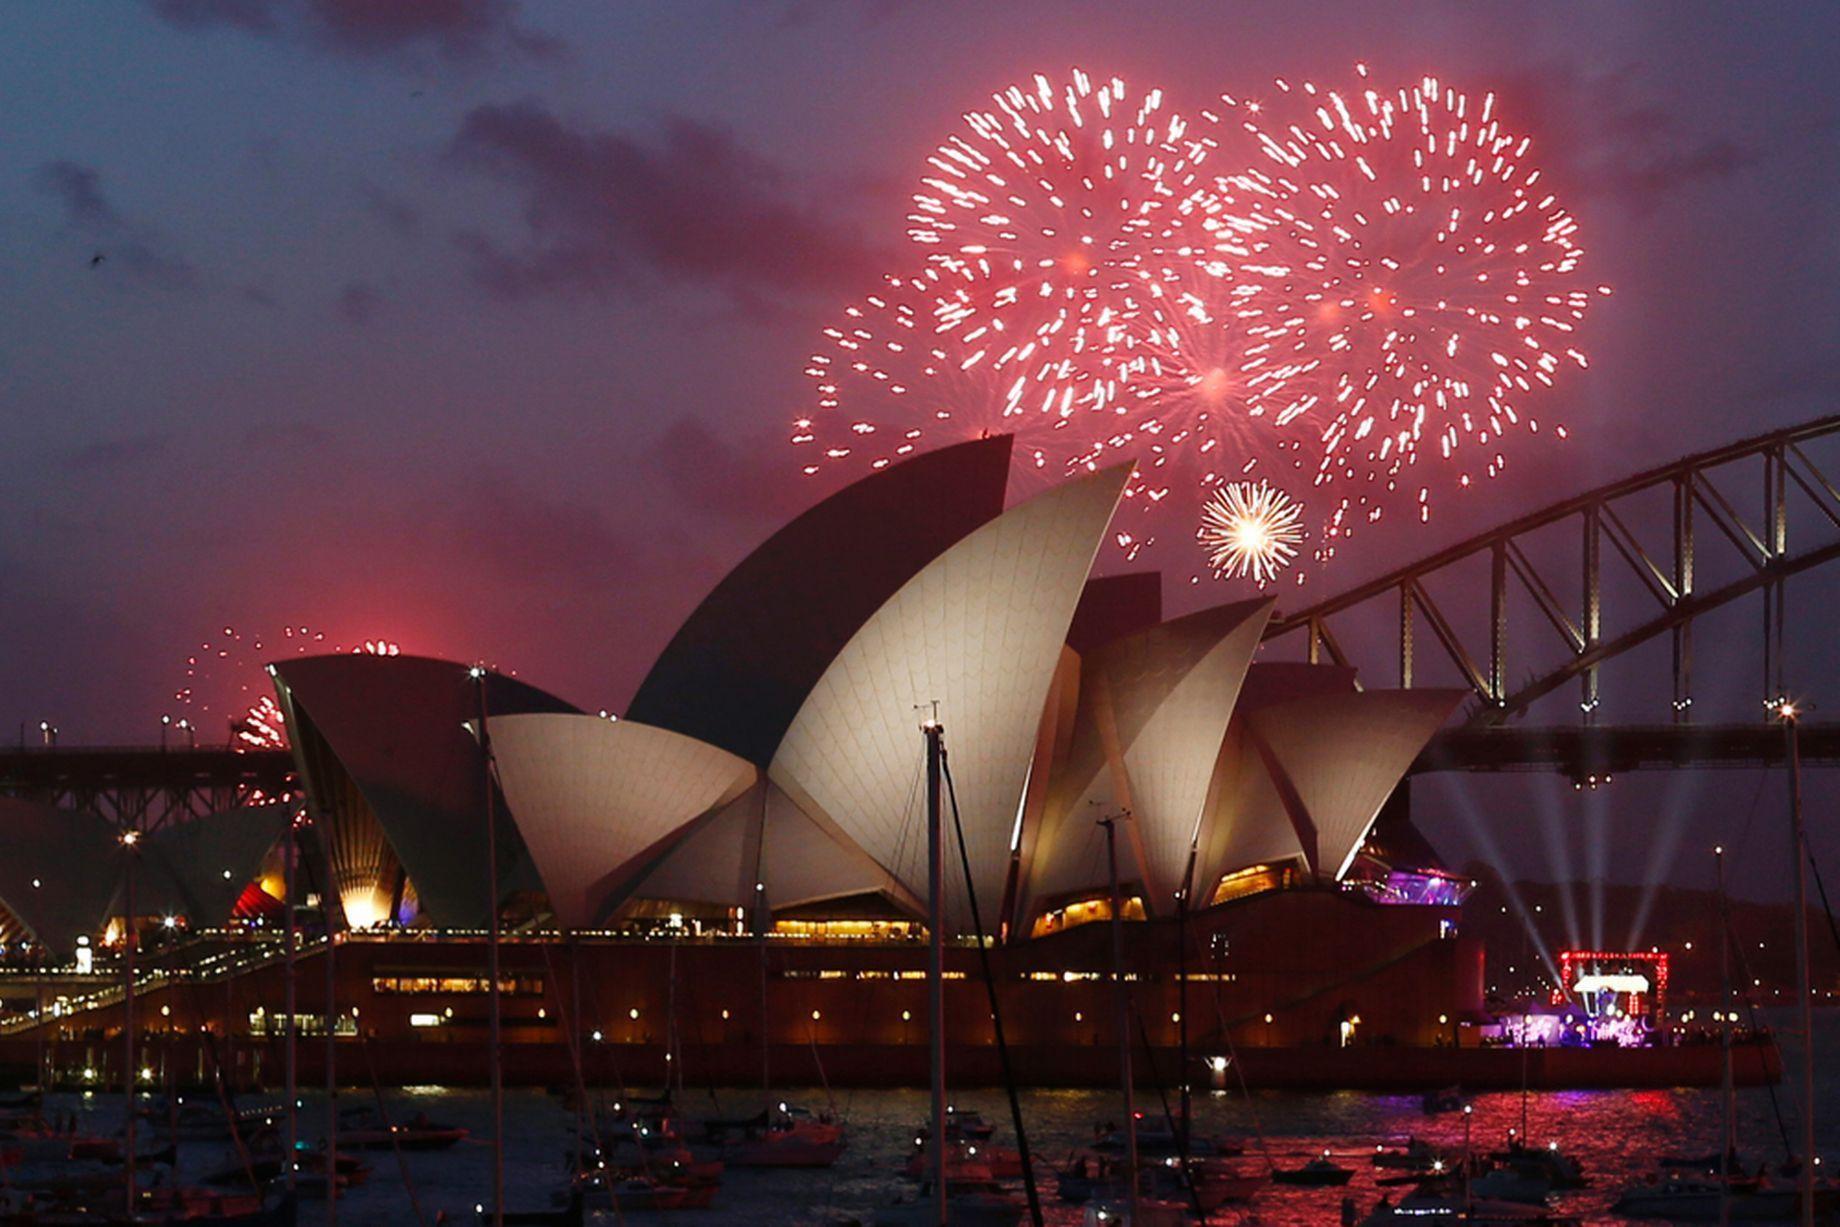 New Year's Eve Celebrations at Australia 2015